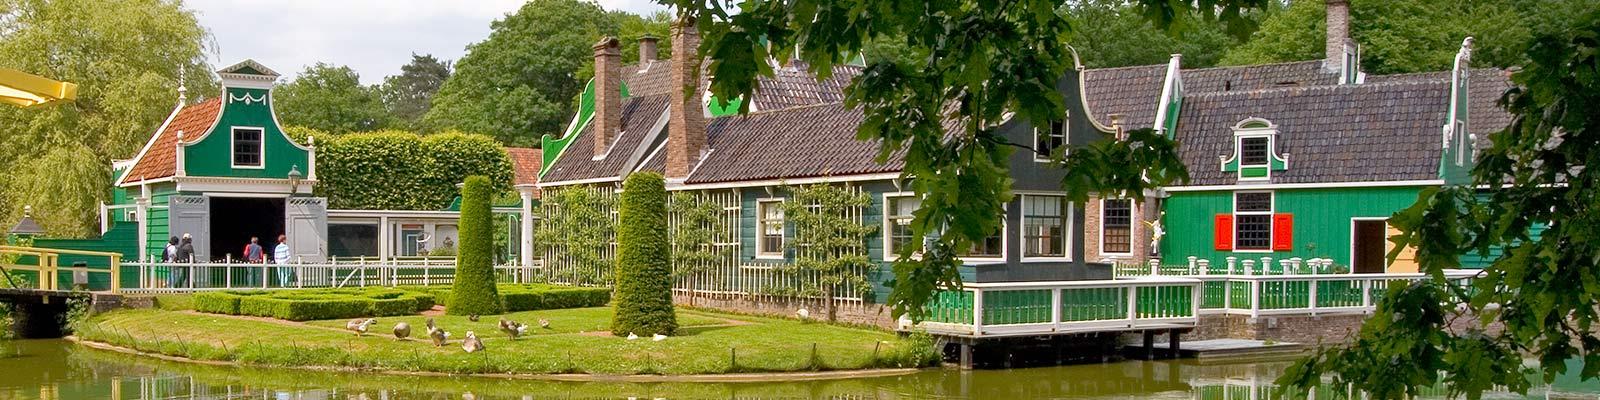 Arnhem Netherlands  city pictures gallery : CITIES Arnhem Netherlands HERO 1600x400 tcm21 10691